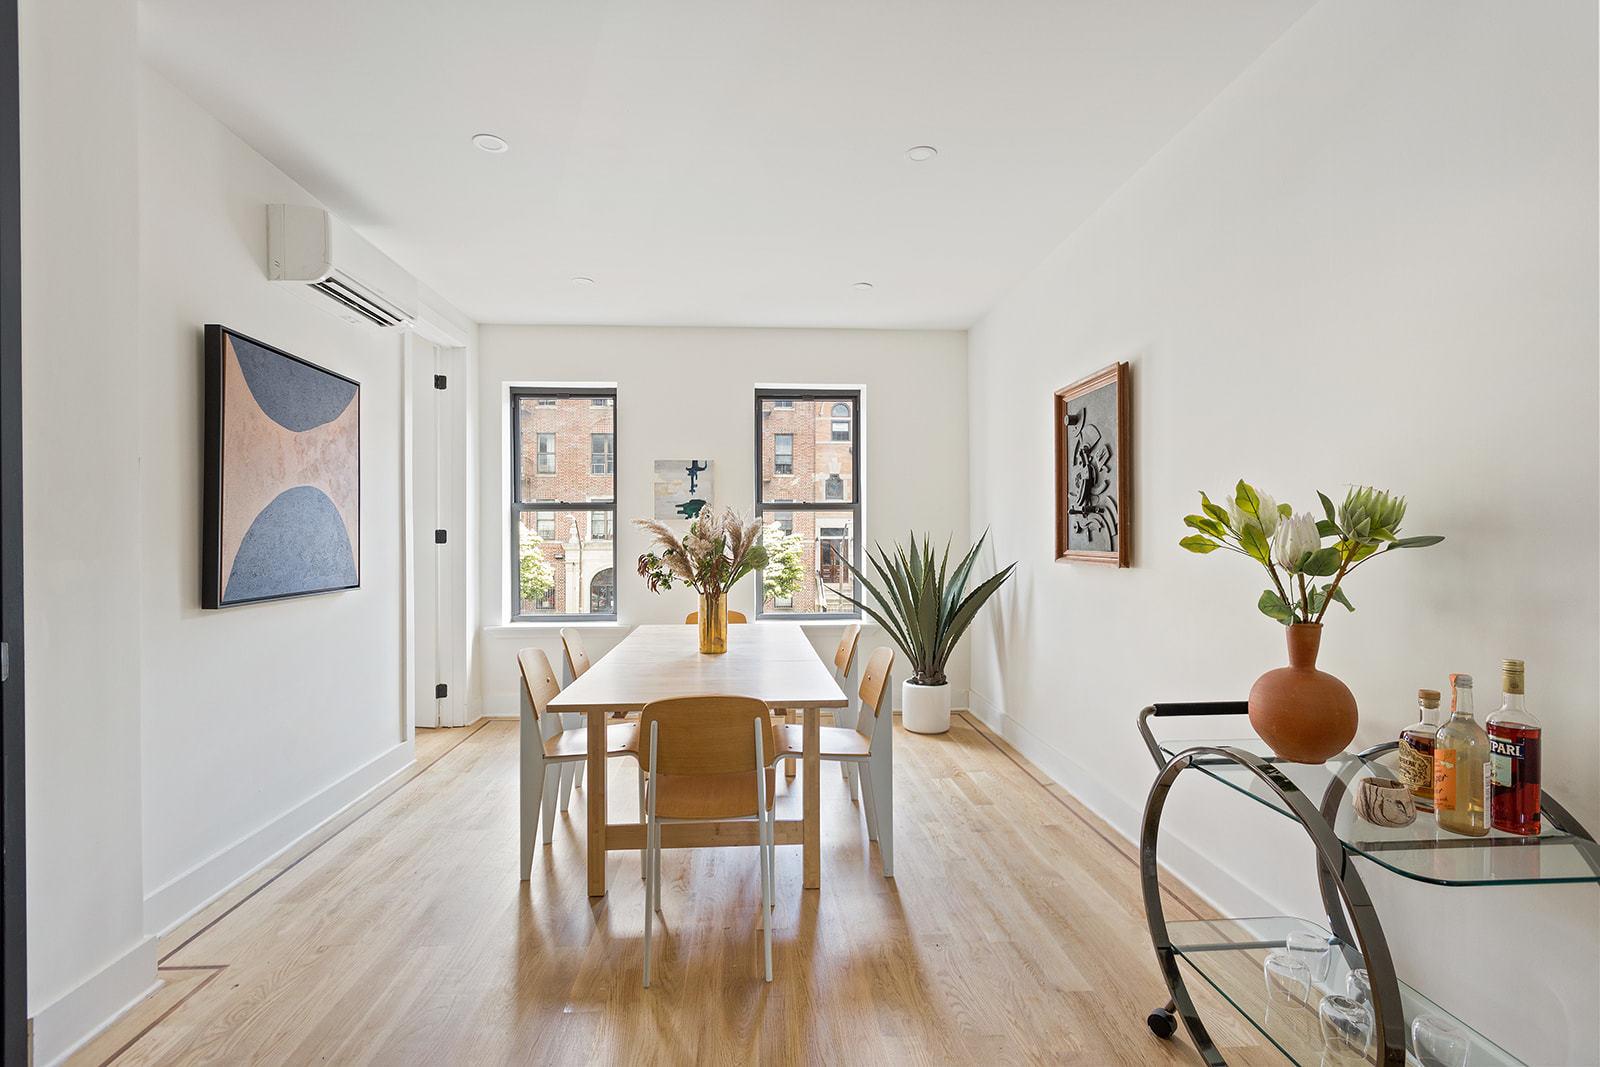 Apartment for sale at 917 Saint Marks Avenue, Apt 2